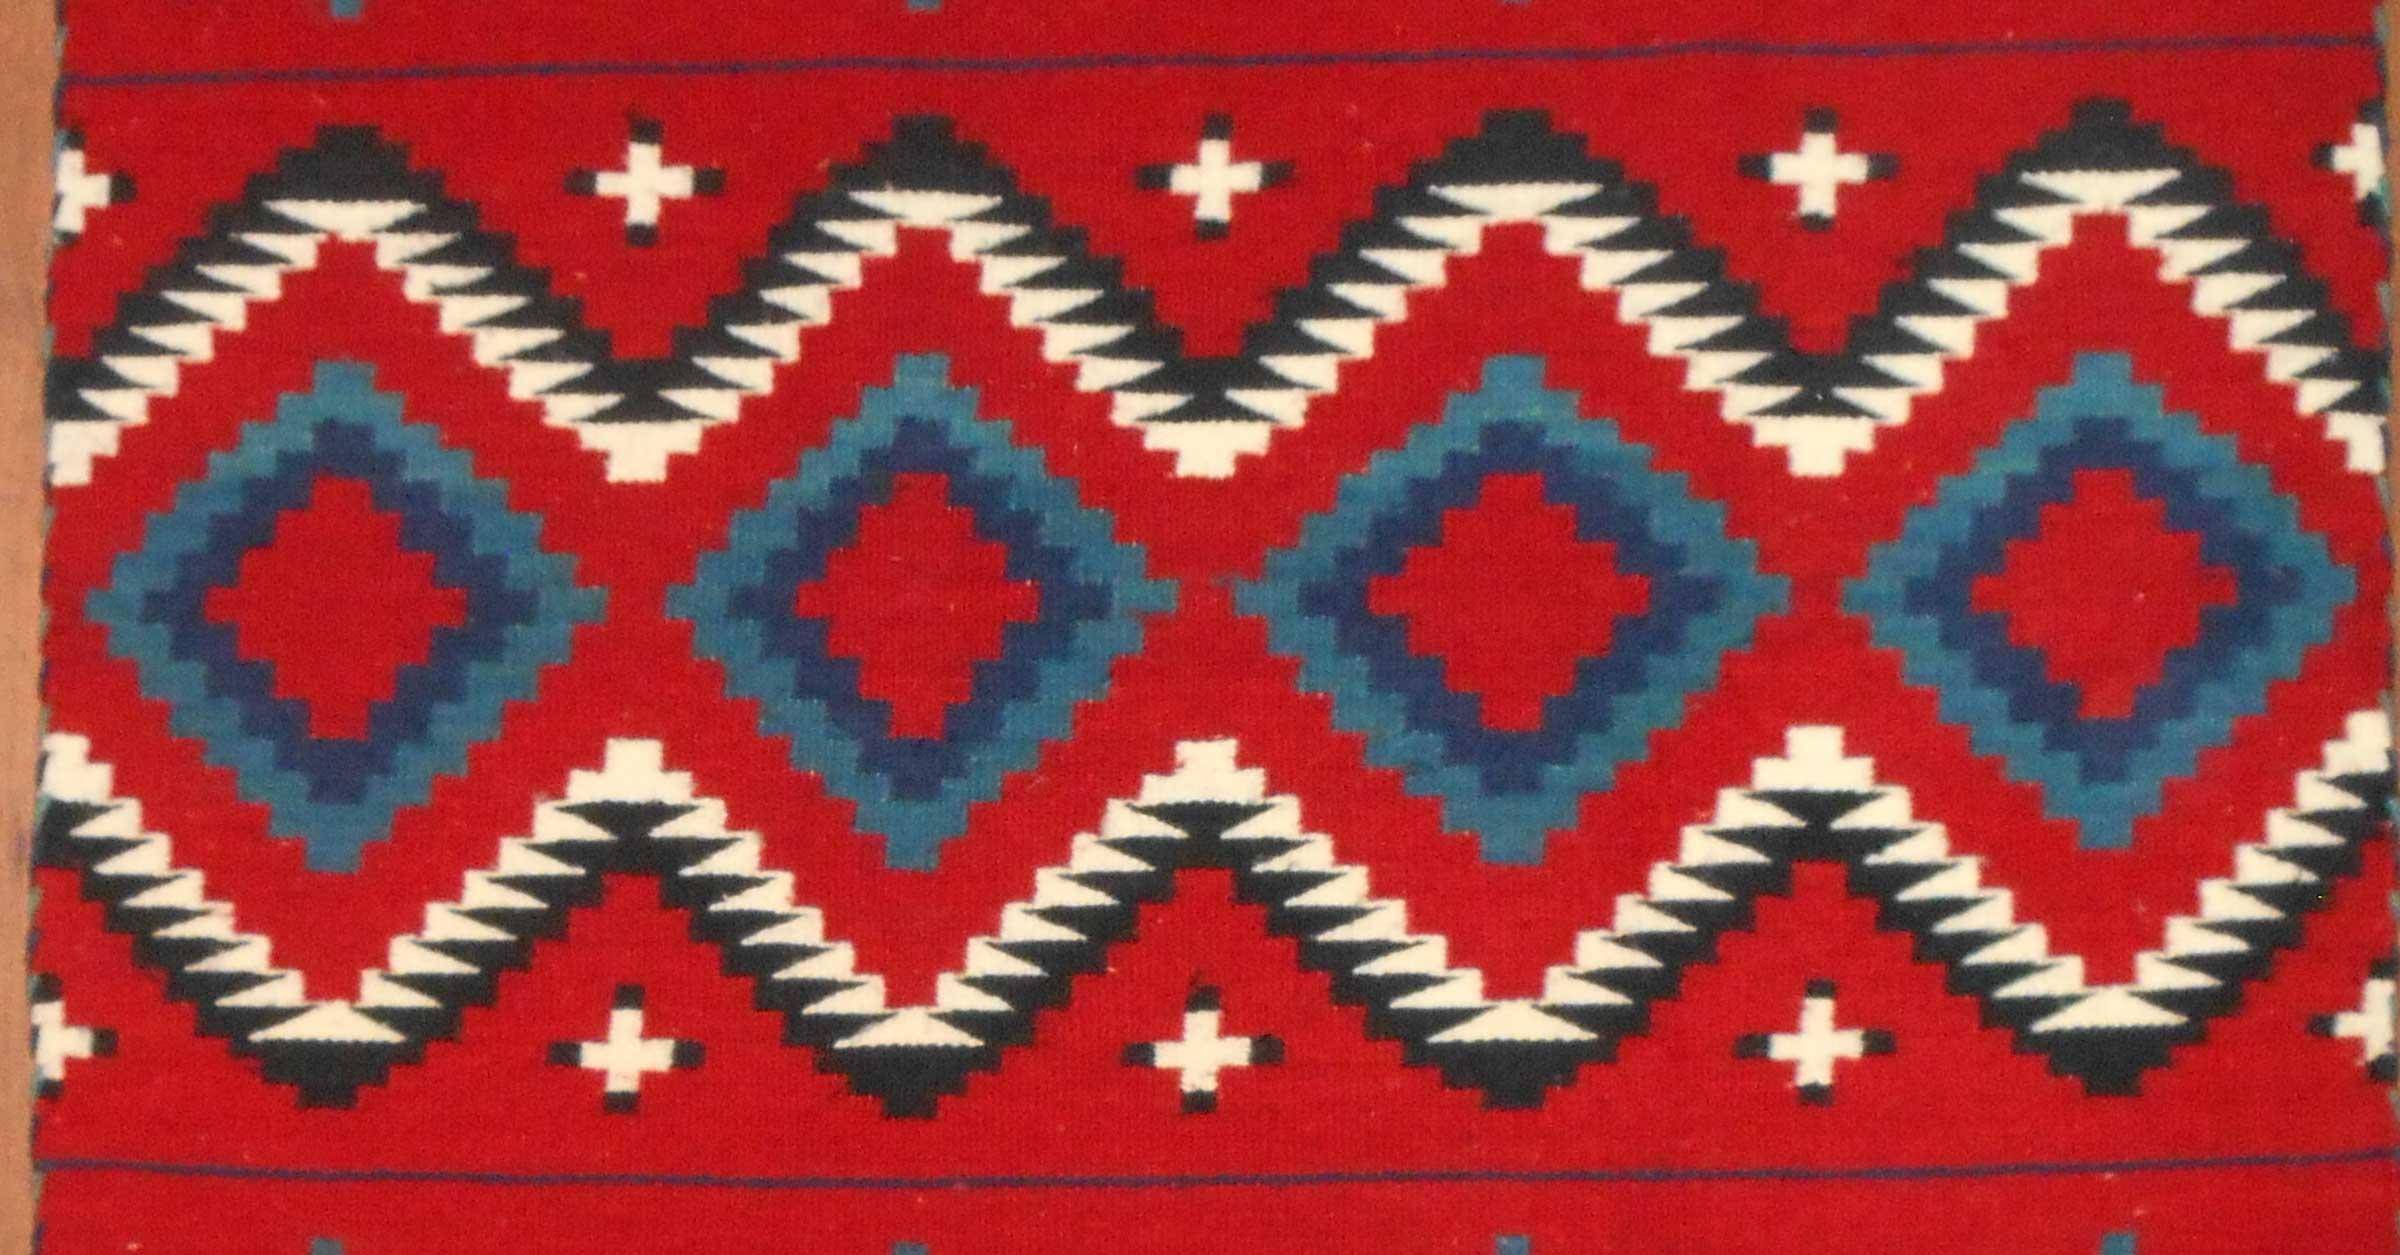 Contemporary Navajo Rug In A Late Classic Period Design